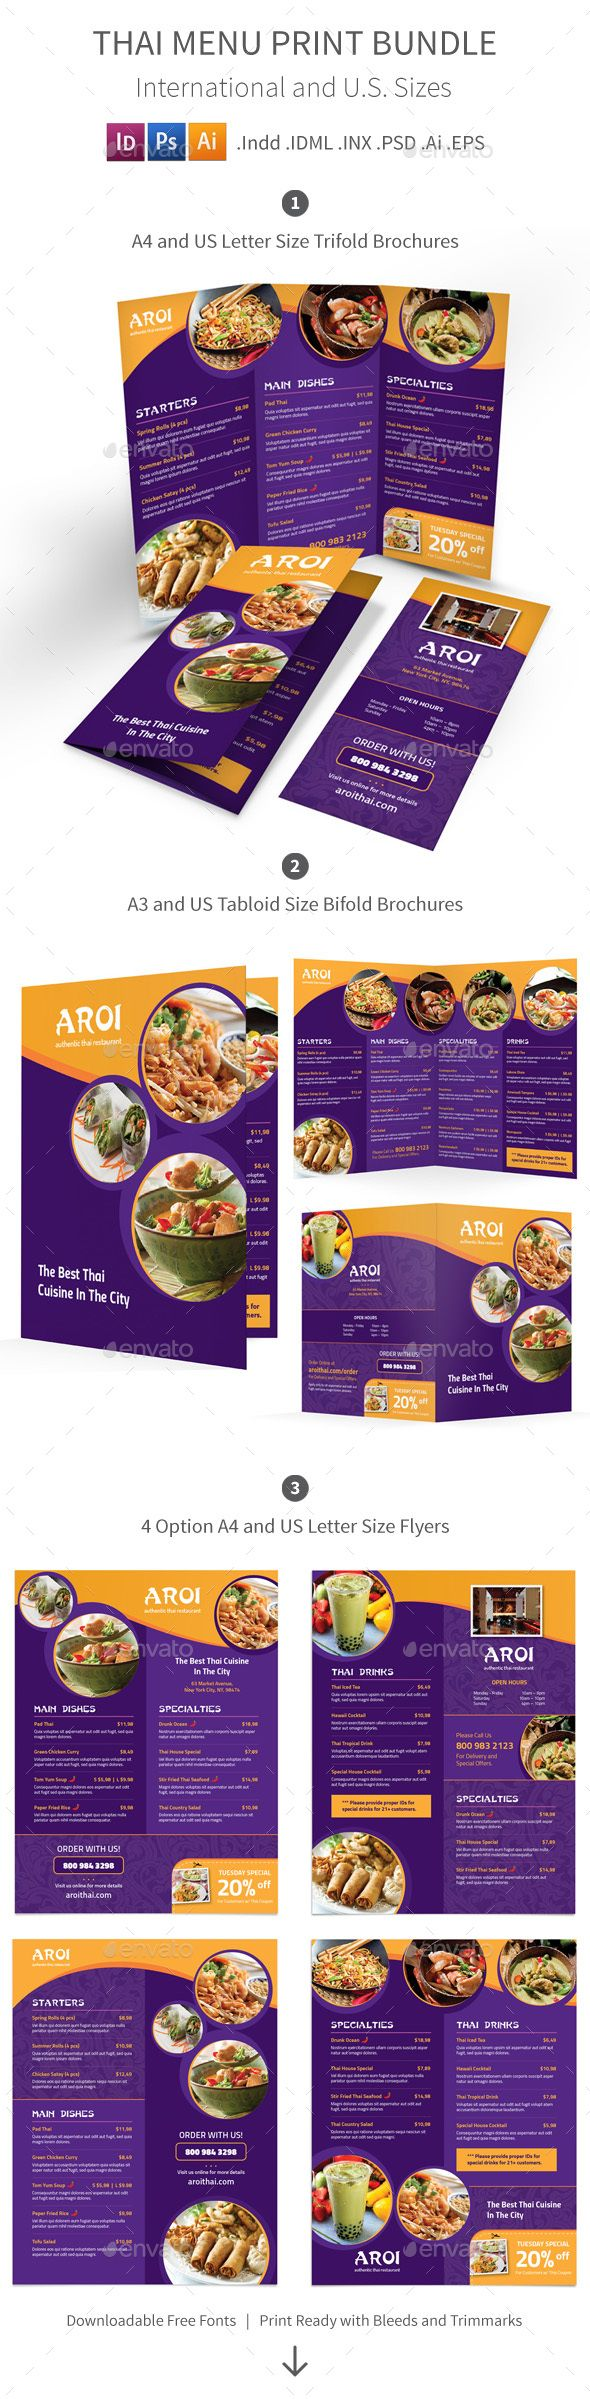 Thai Restaurant Menu Print Bundle — Photoshop PSD #clean #food • Available here → https://graphicriver.net/item/thai-restaurant-menu-print-bundle/15881747?ref=pxcr